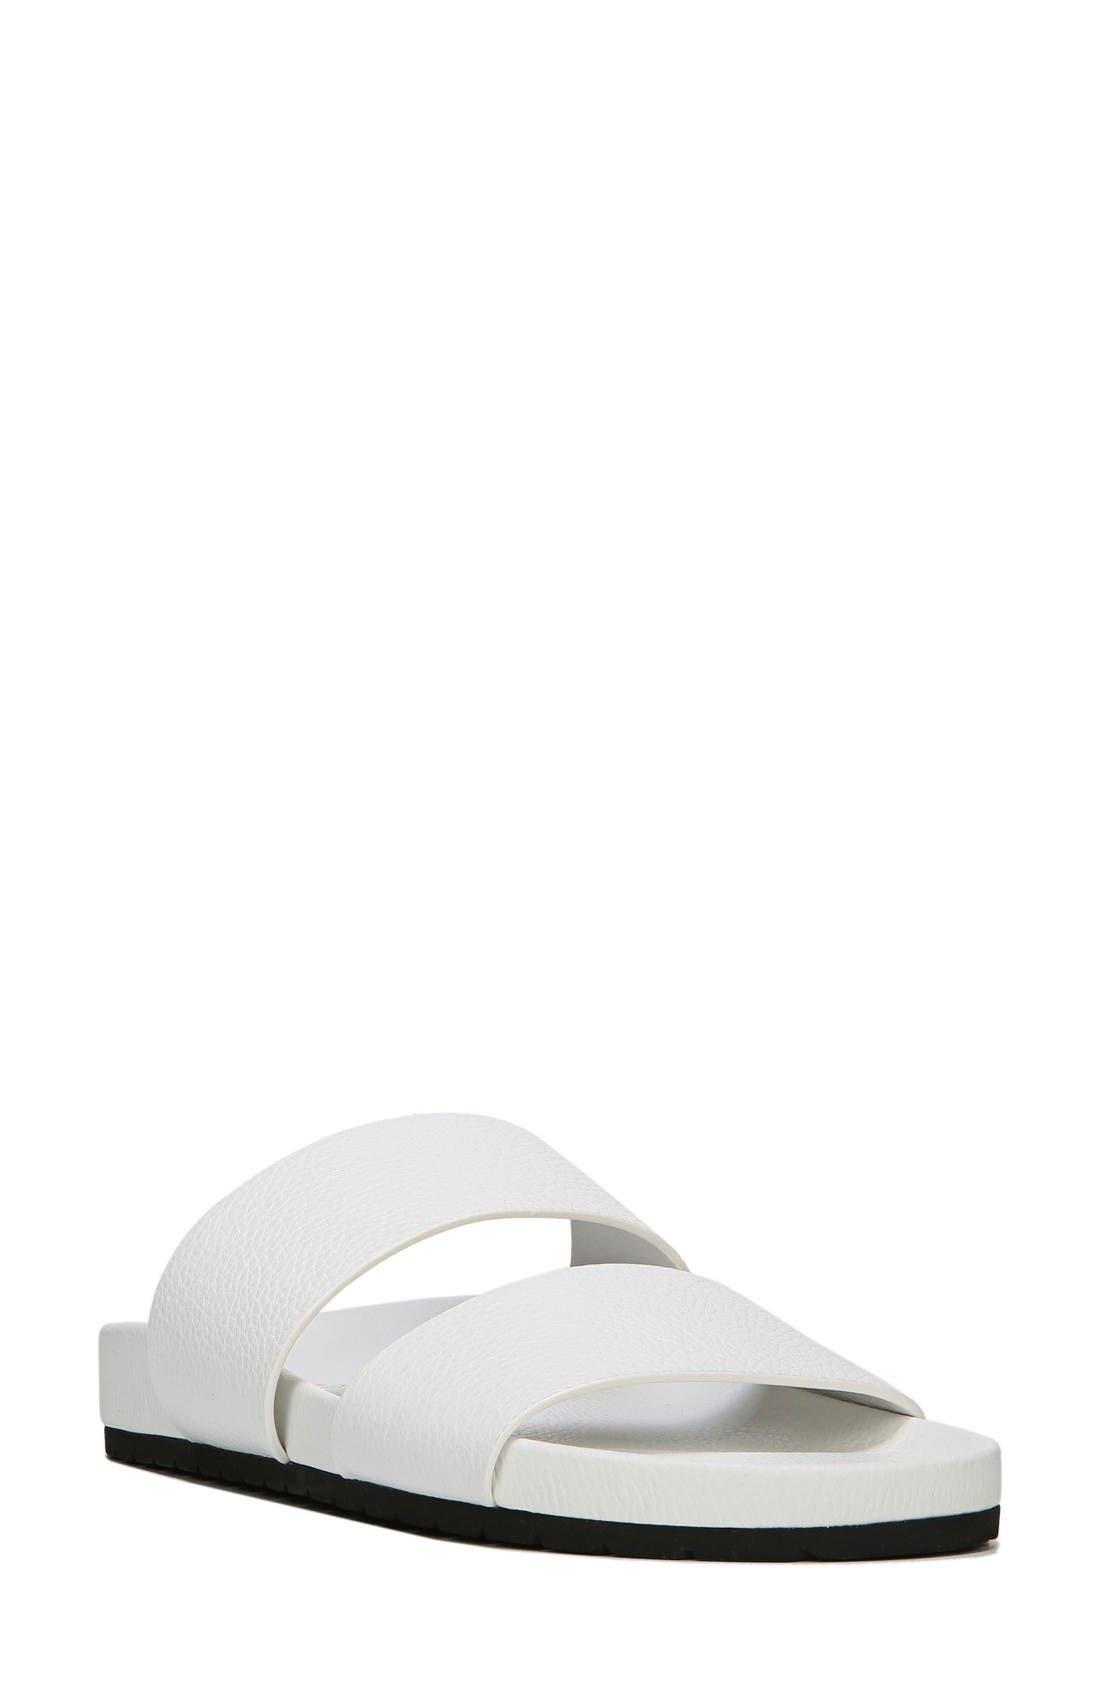 Georgie Slide Sandal,                             Main thumbnail 1, color,                             White